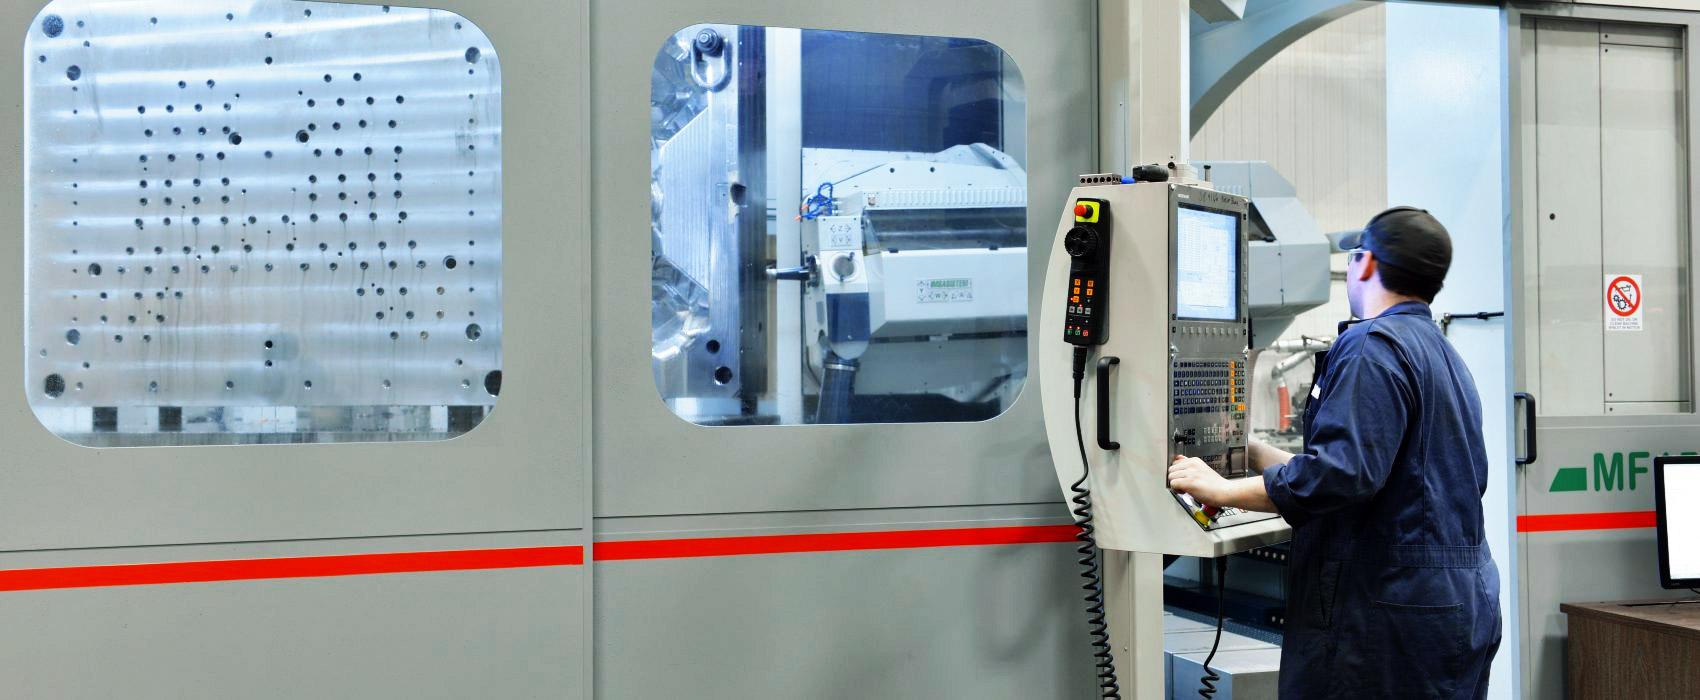 We're Hiring!   Cavalier Tool & Manufacturing LTD  - Windsor